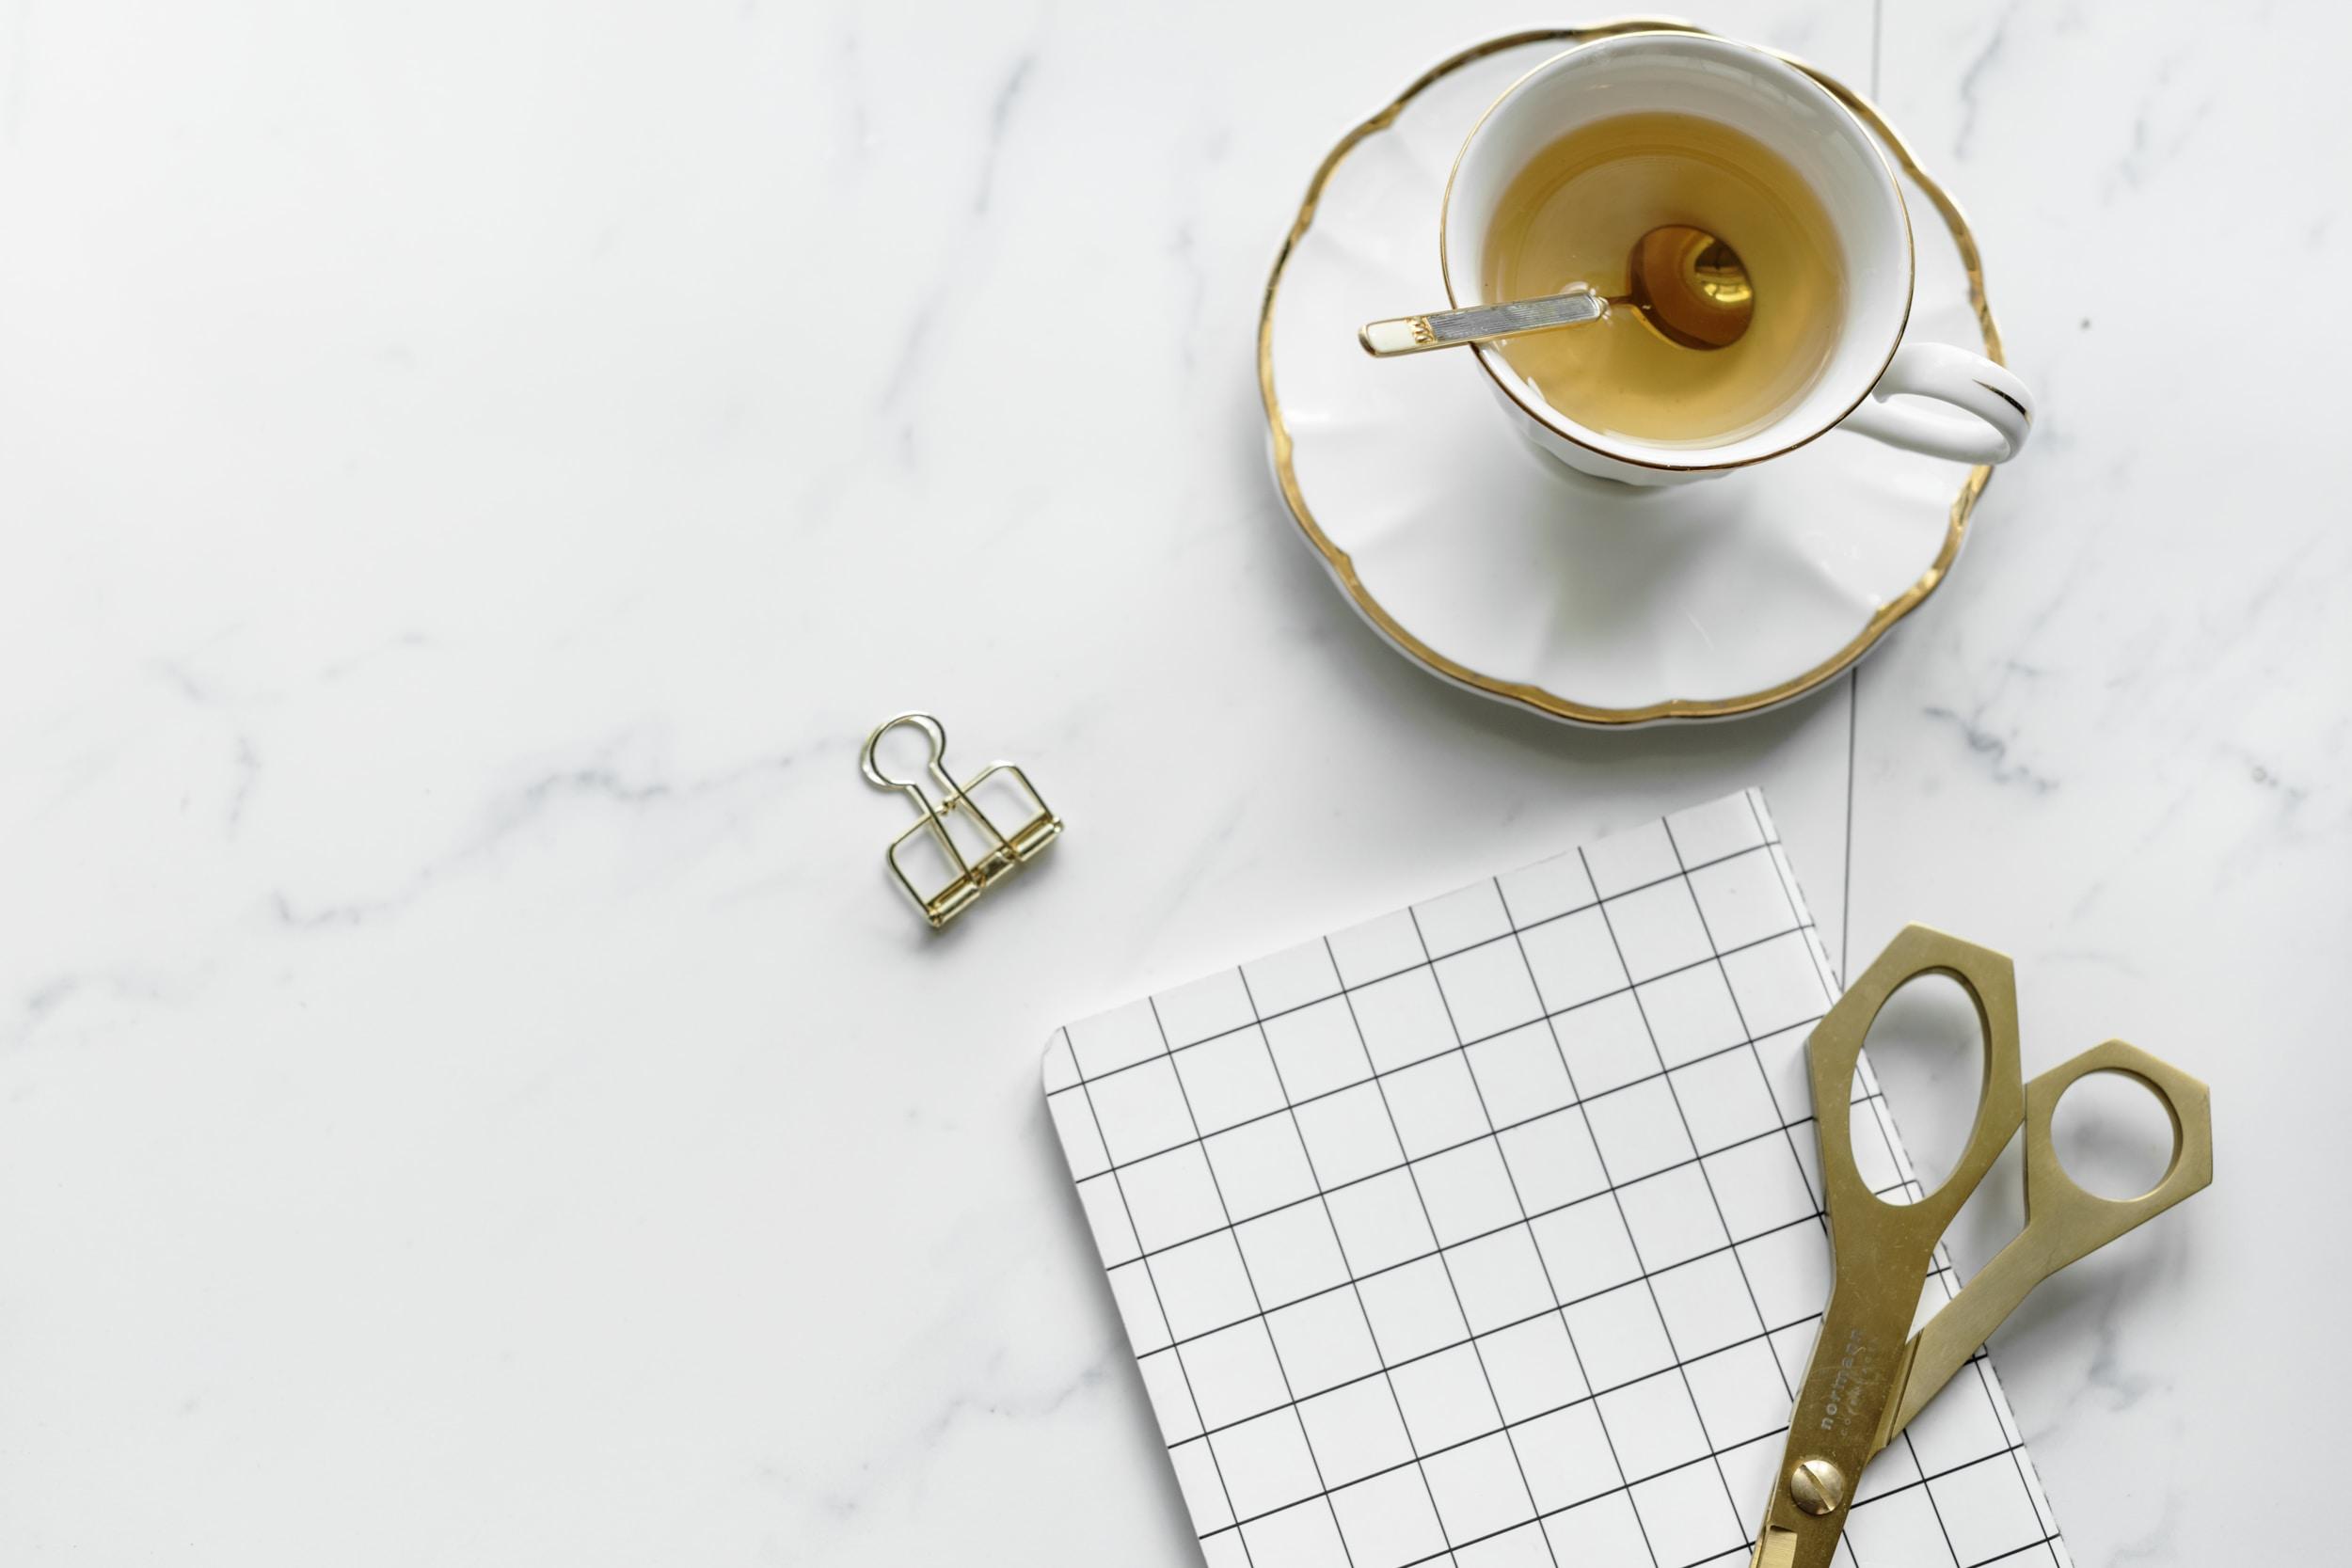 white ceramic teacup on saucer beside shears